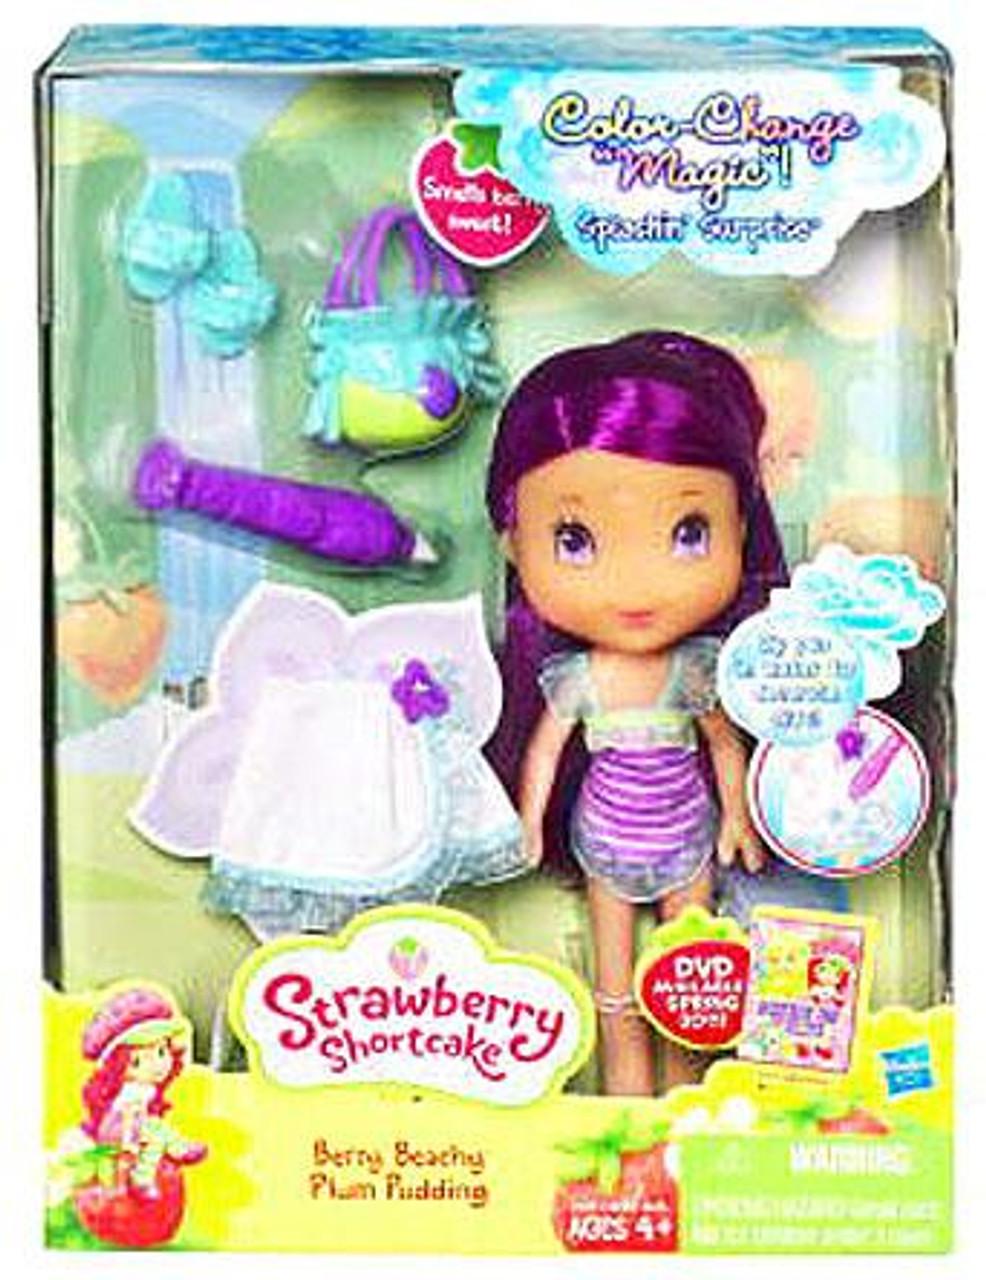 Strawberry Shortcake Splashin' Surprise Berry Beachy Plum Pudding Doll Set